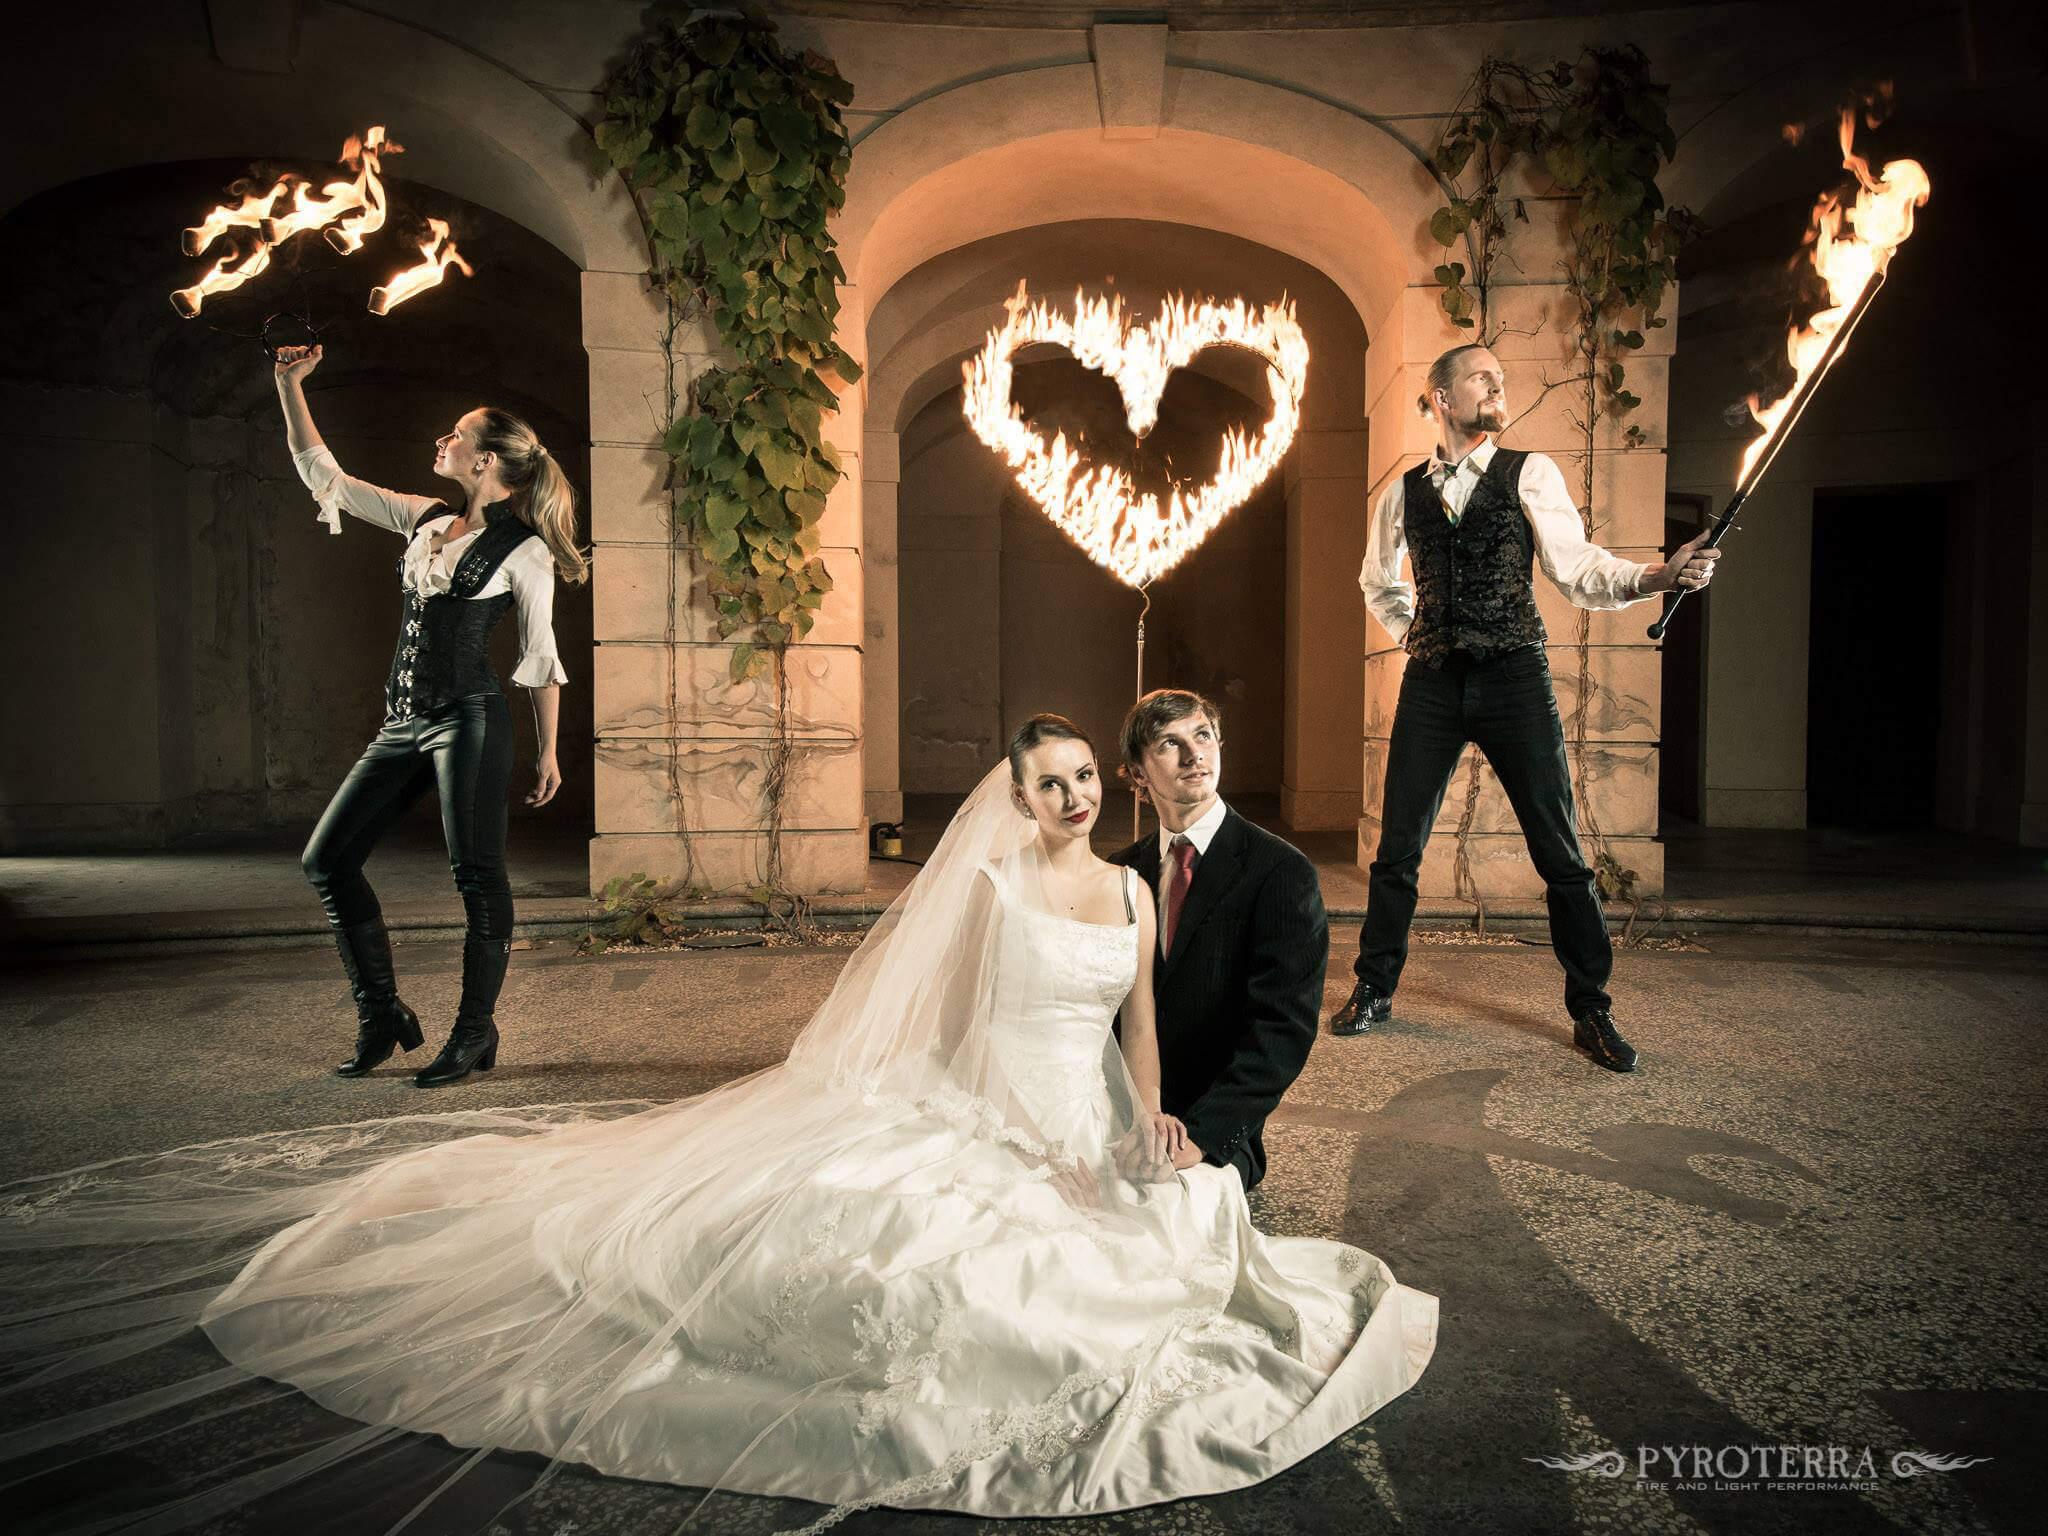 Pyroterra-Romantic-show-00021